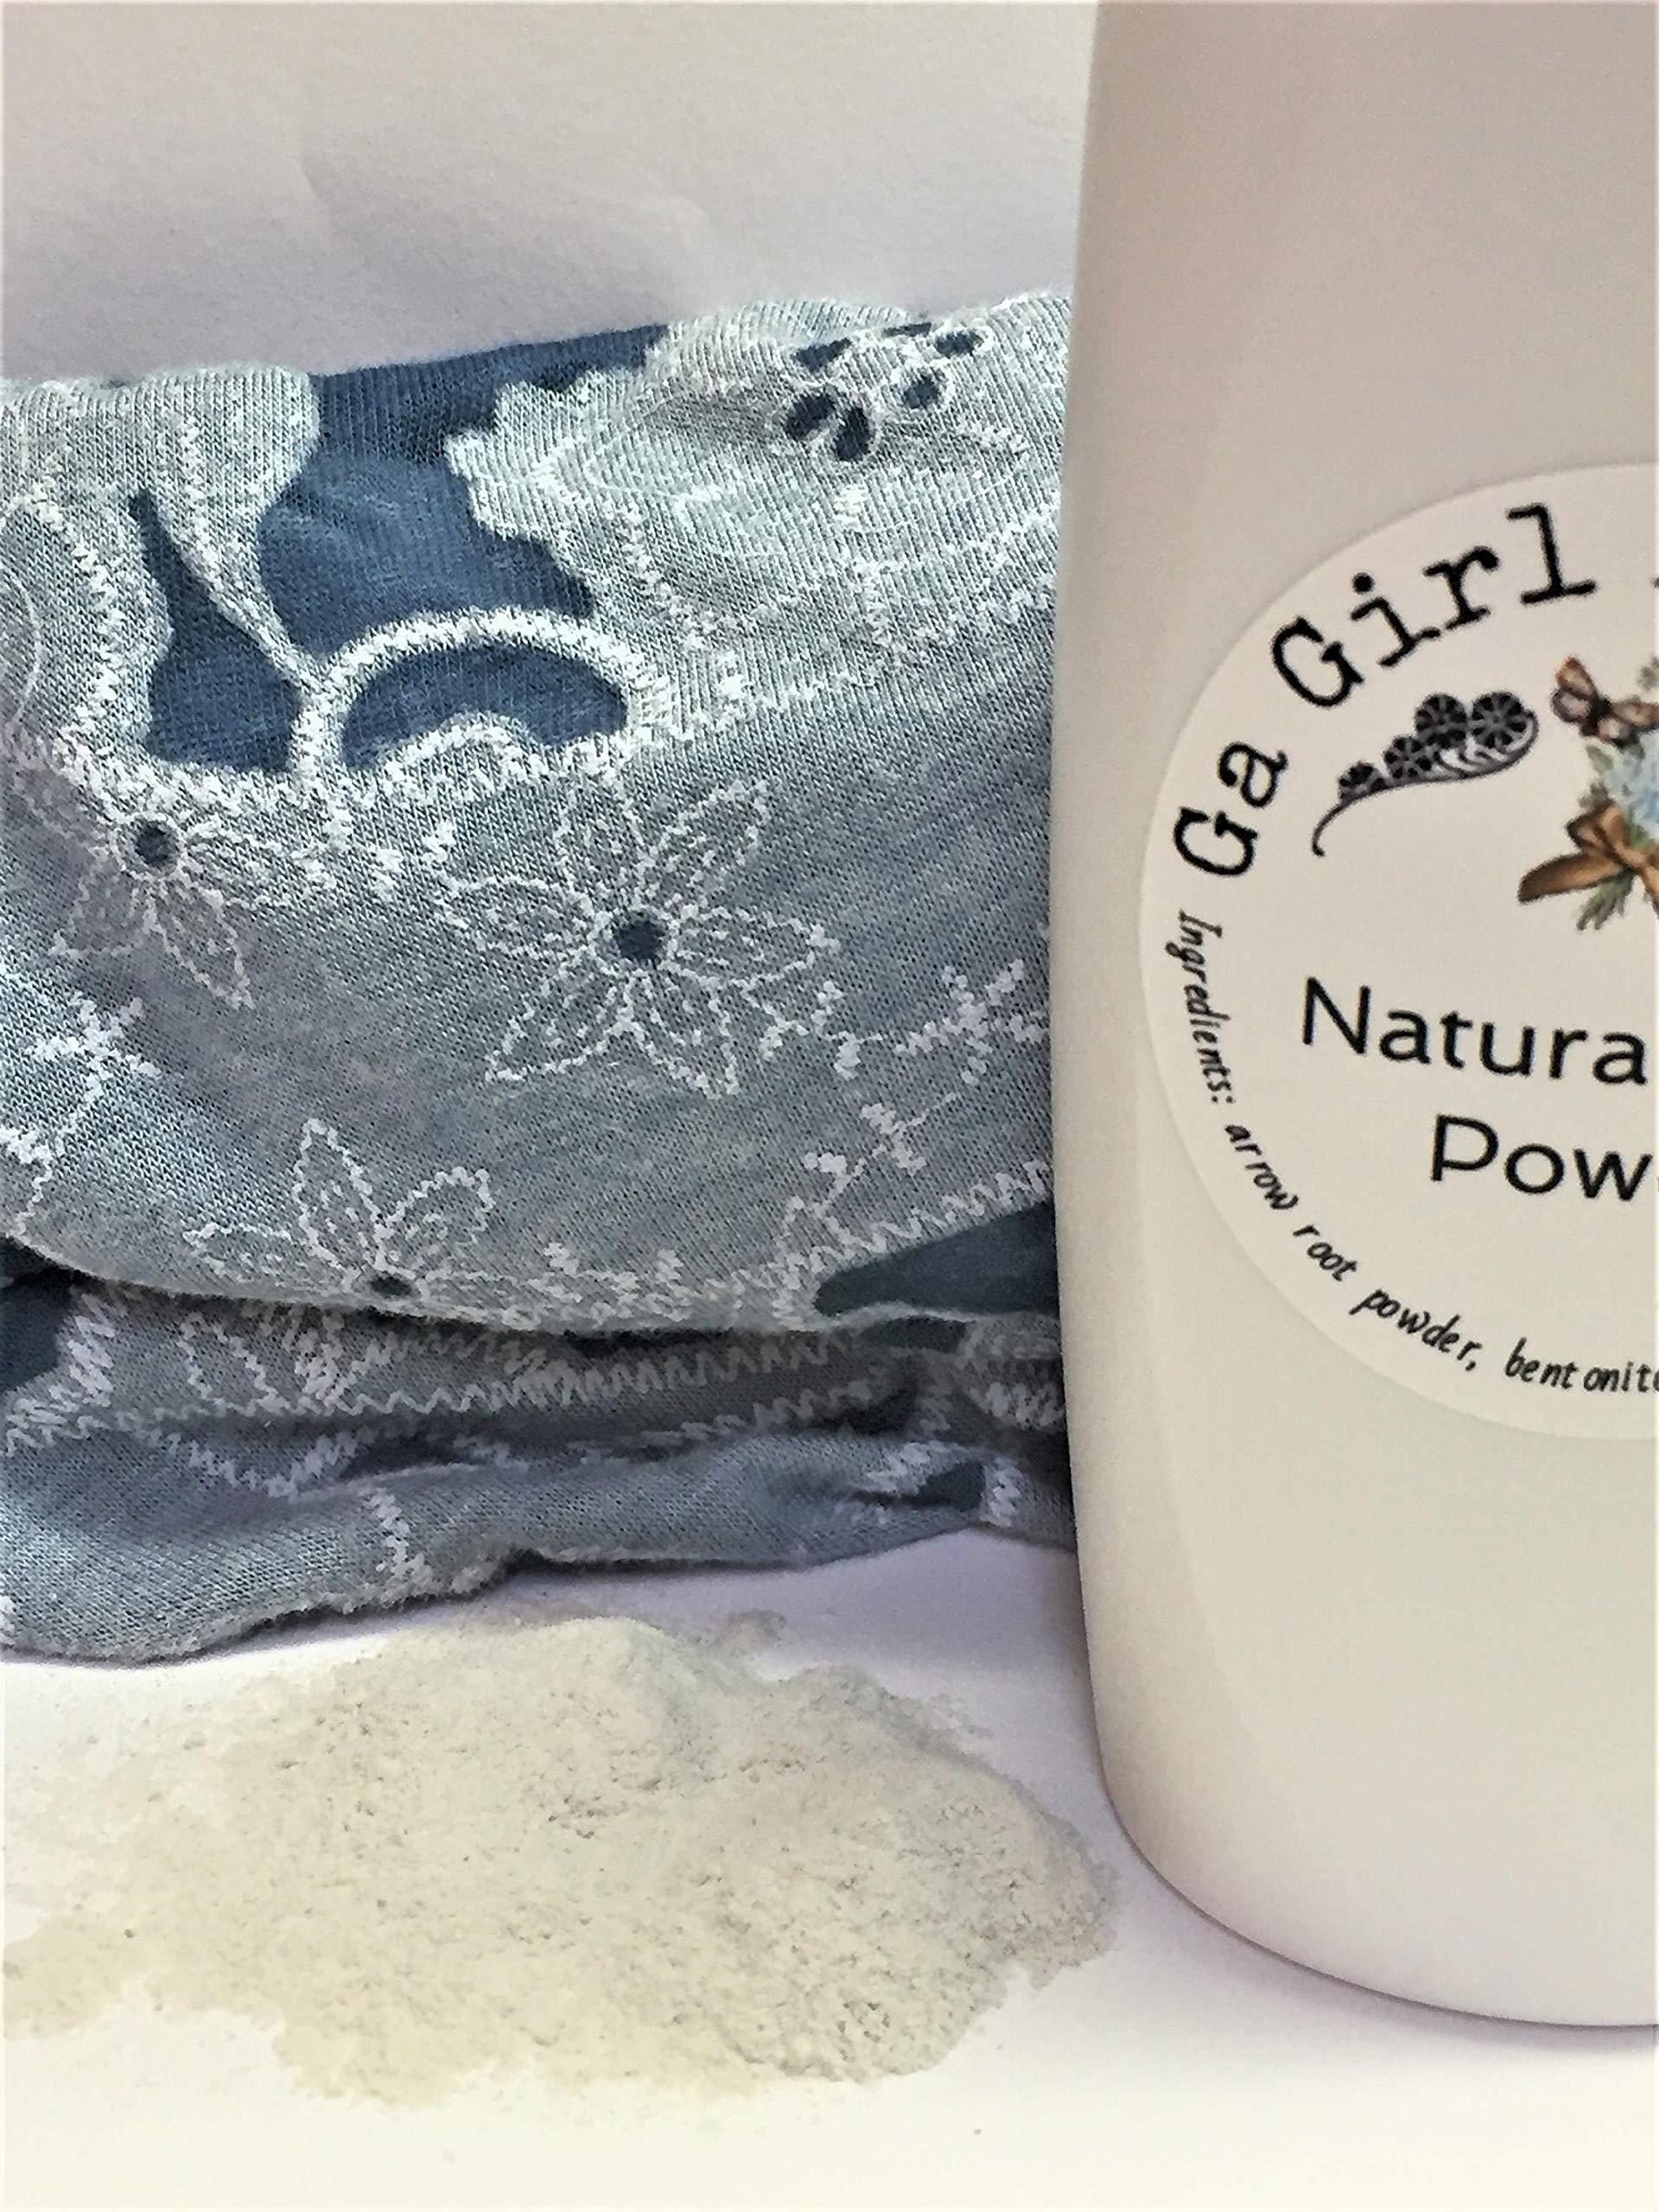 Viva La Juicy Type Natural Deodorizing Body Powder, Dusting Powder, Perfume Body Powder, Talc Free